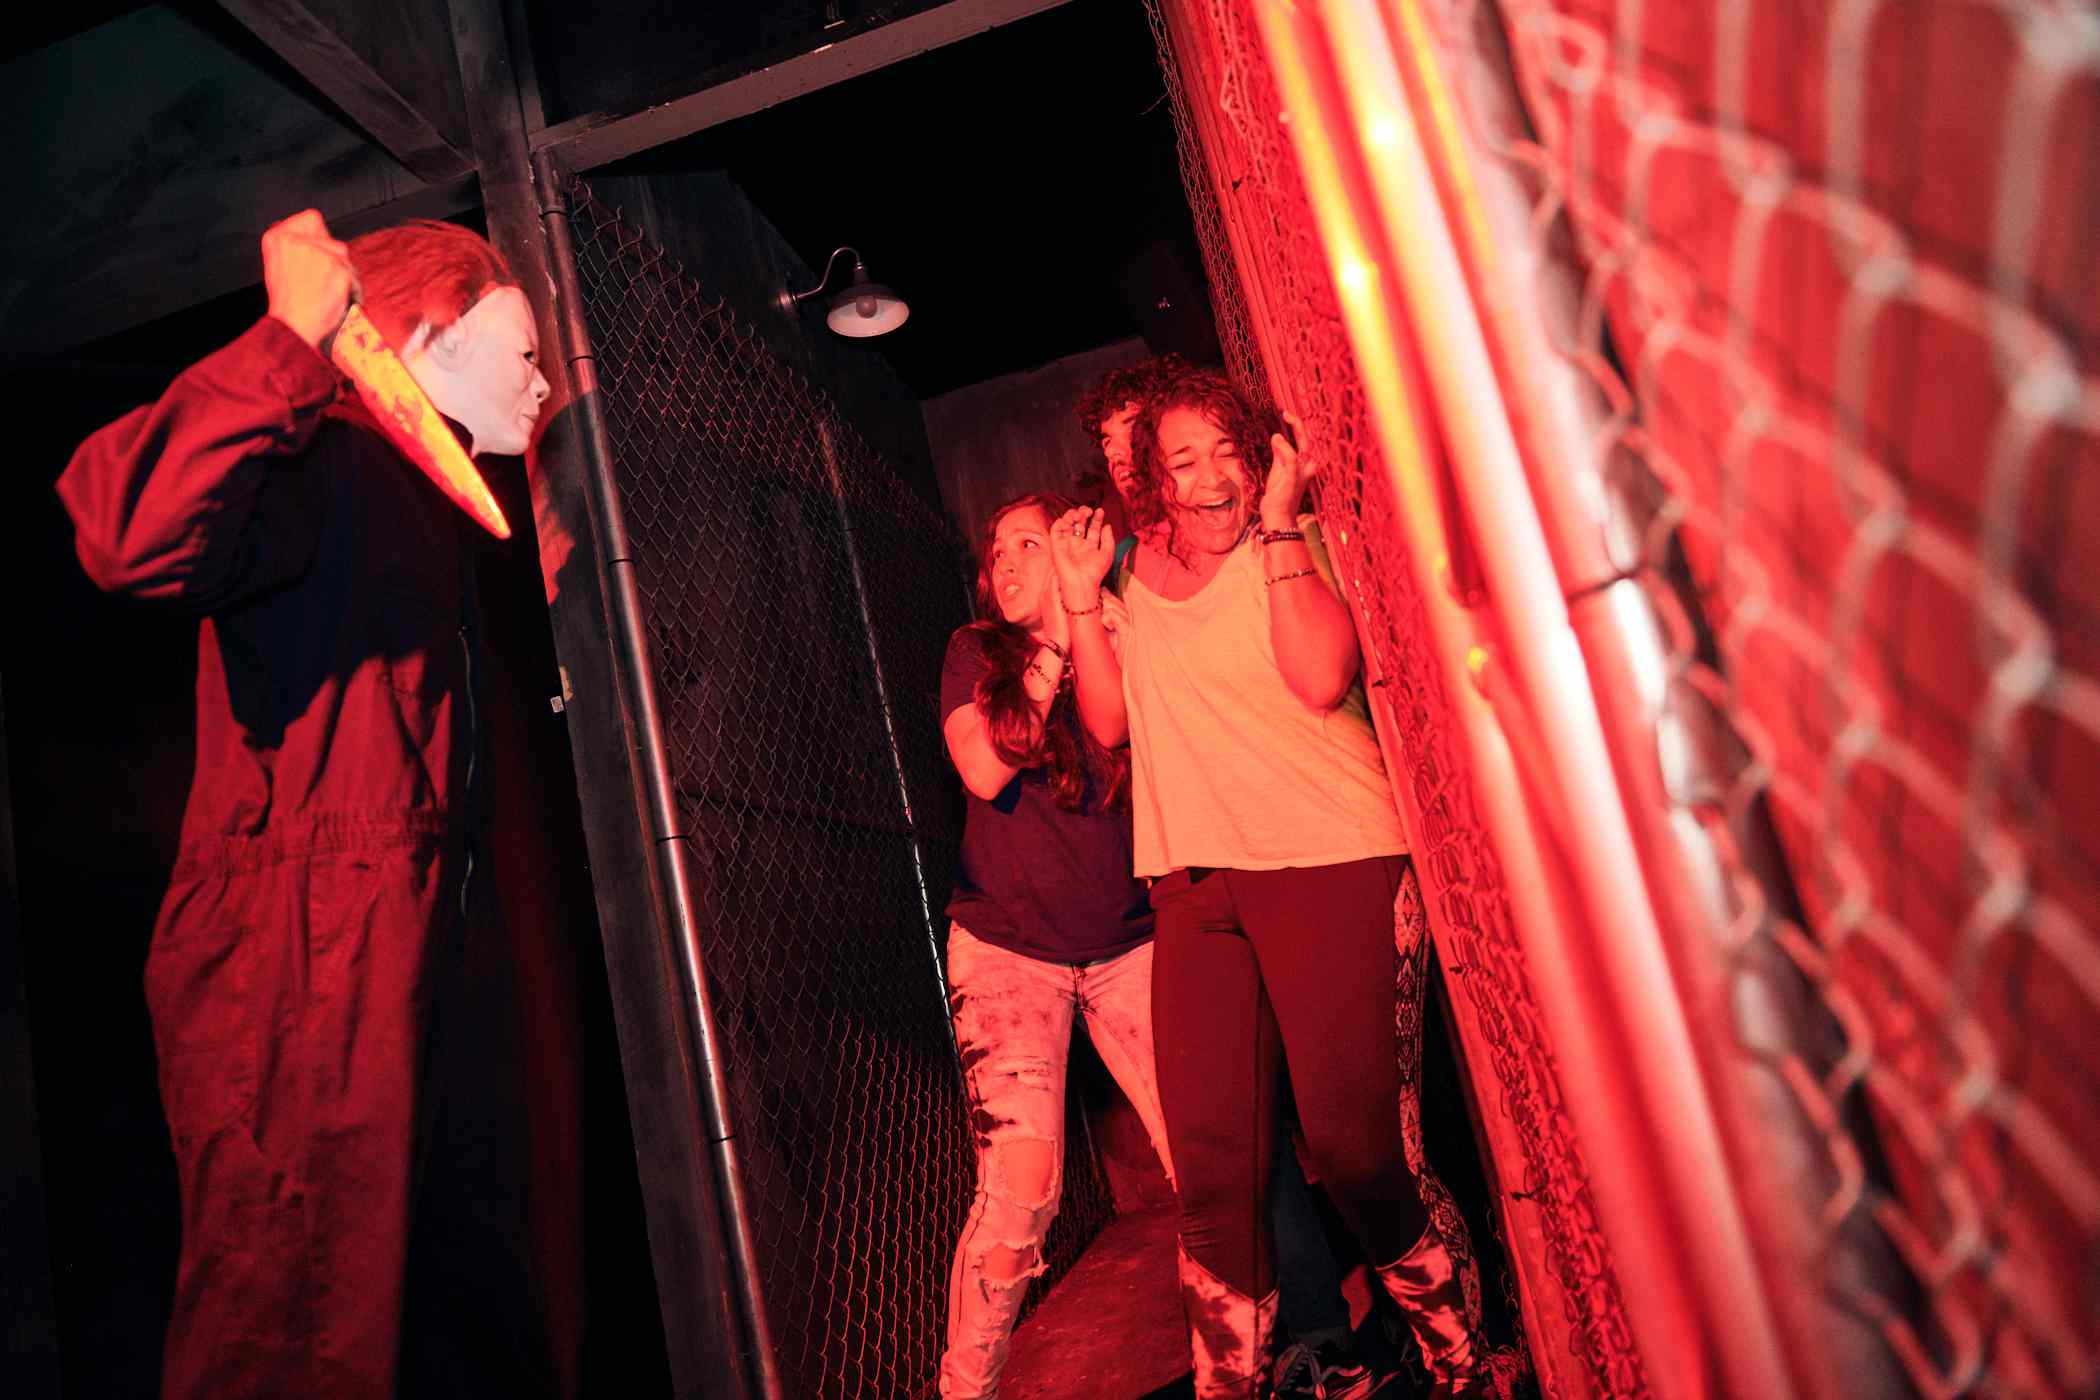 Halloween 4 The Return of Michael Myers house at Universal Halloween Horror Nights